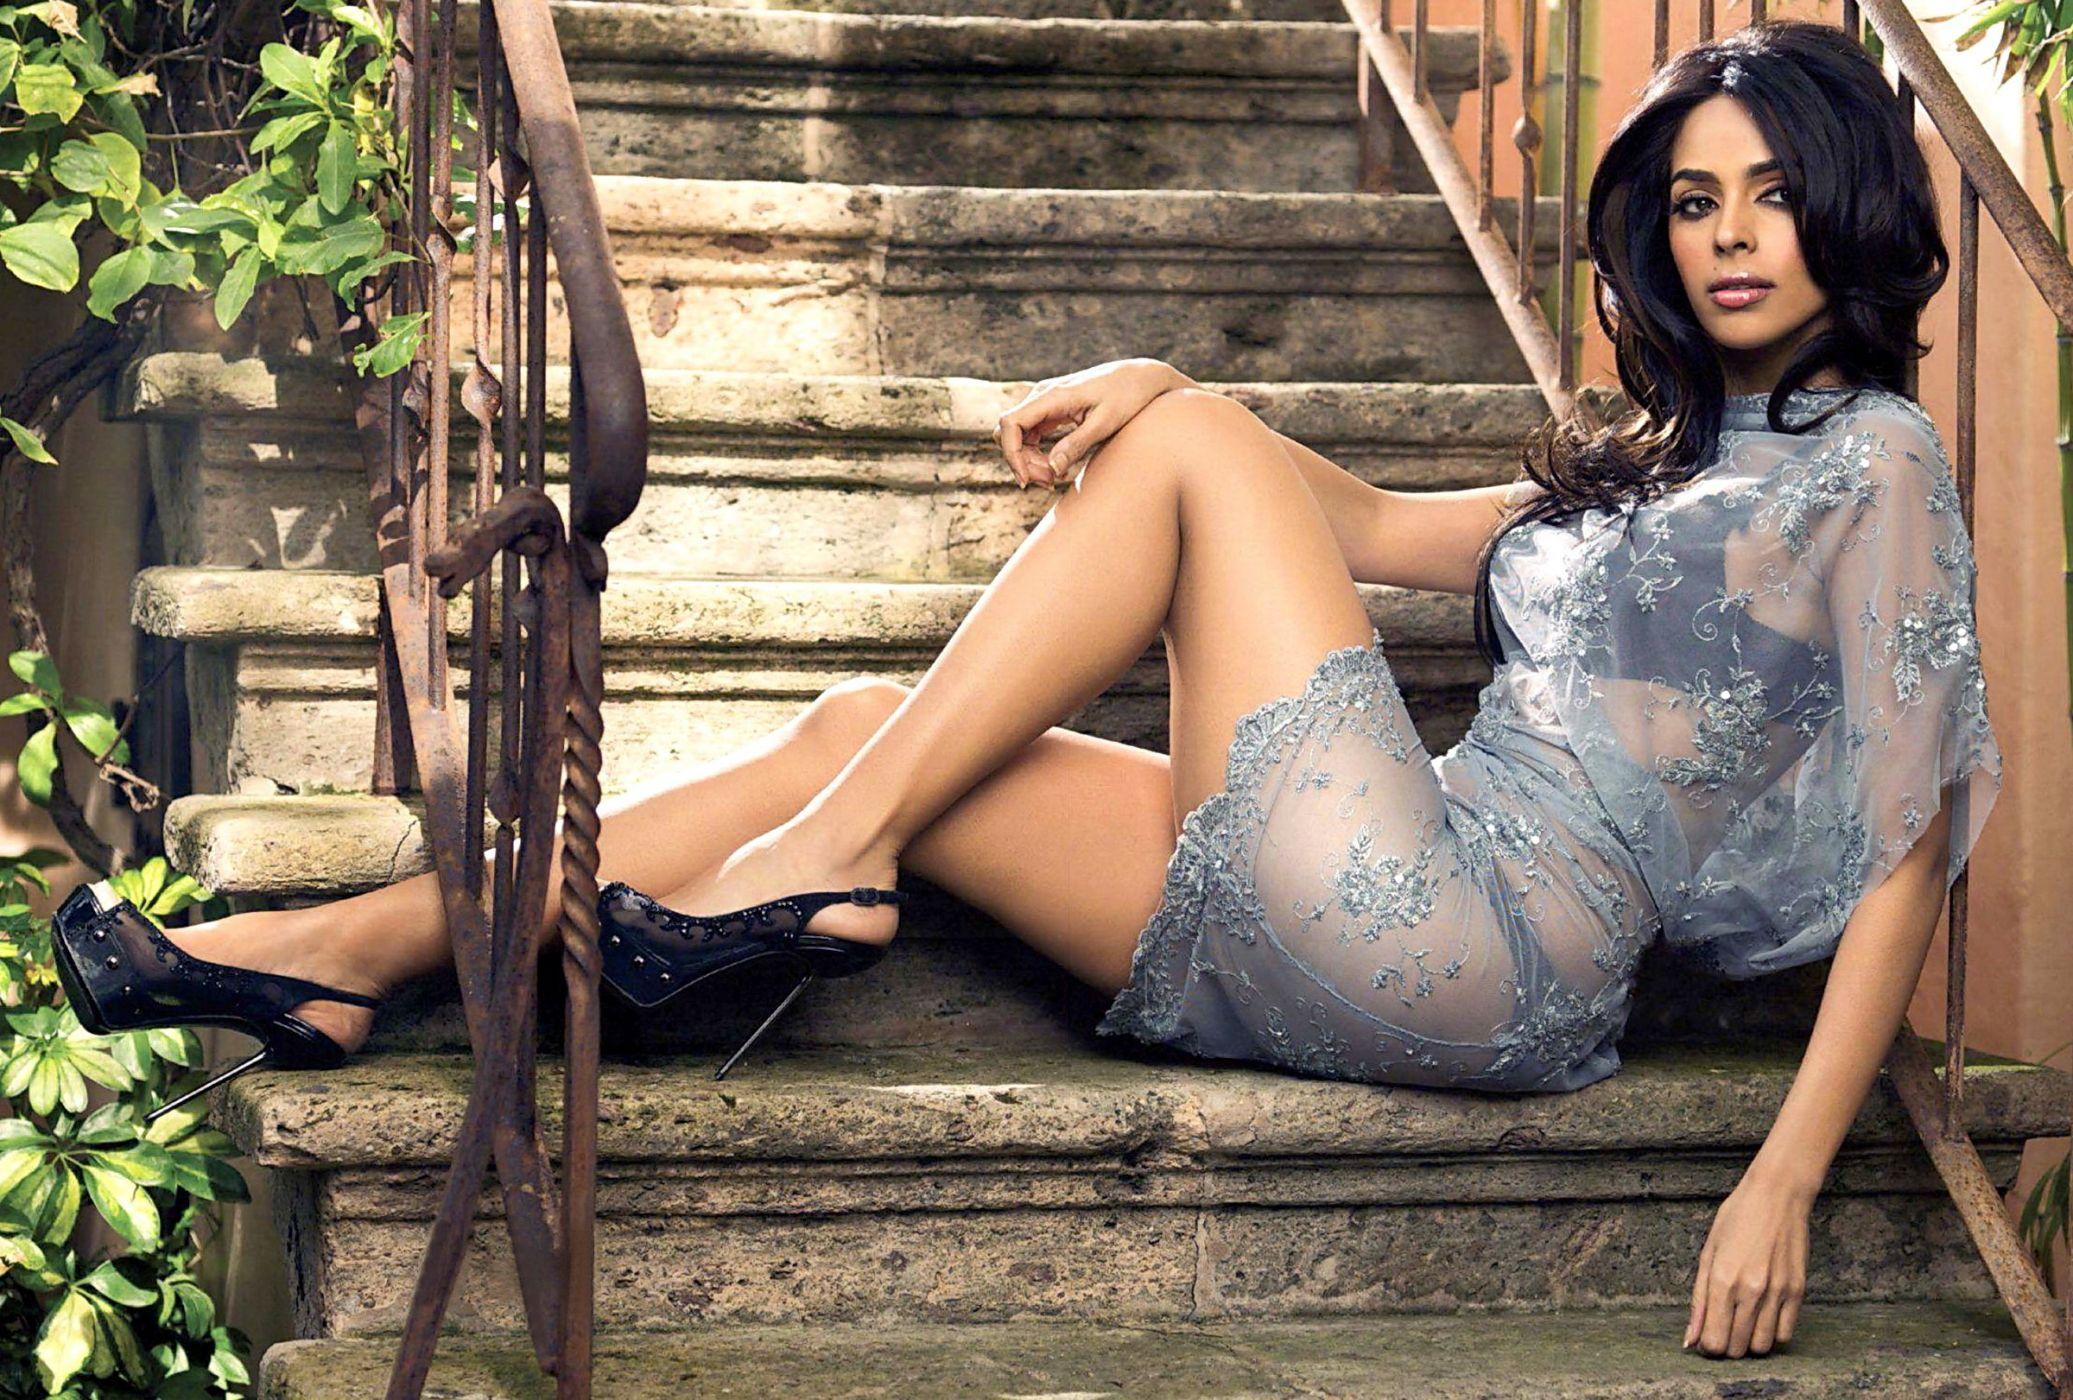 Mallika sherawat nude in saree showing boobs and ass